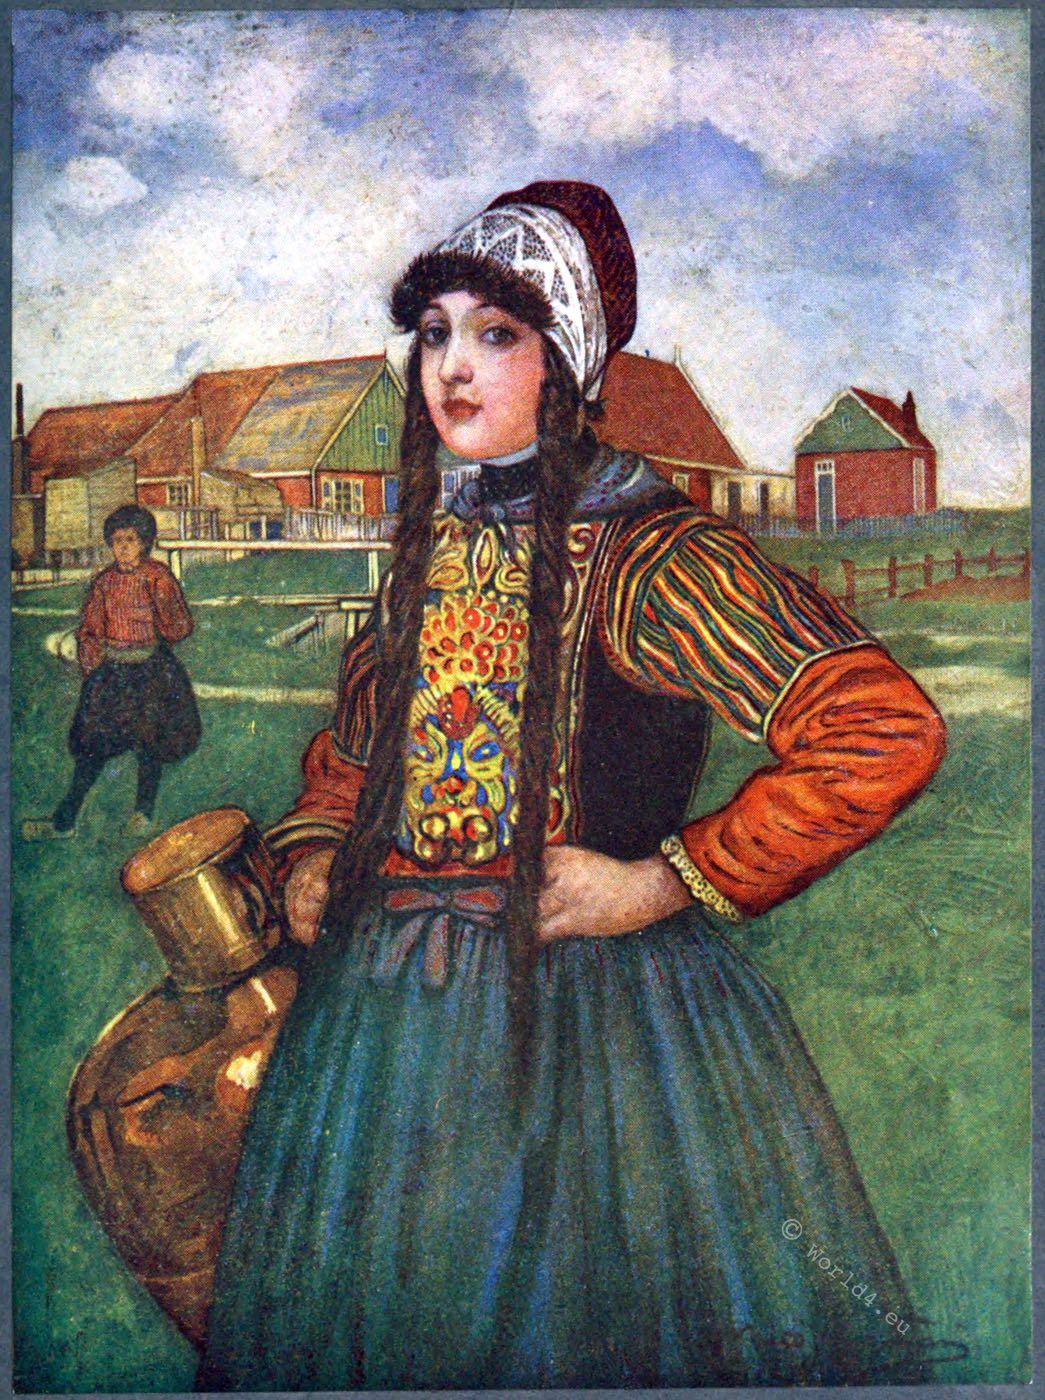 Traditional costume, Marken, Holland, Netherlands, Jungman, Nico